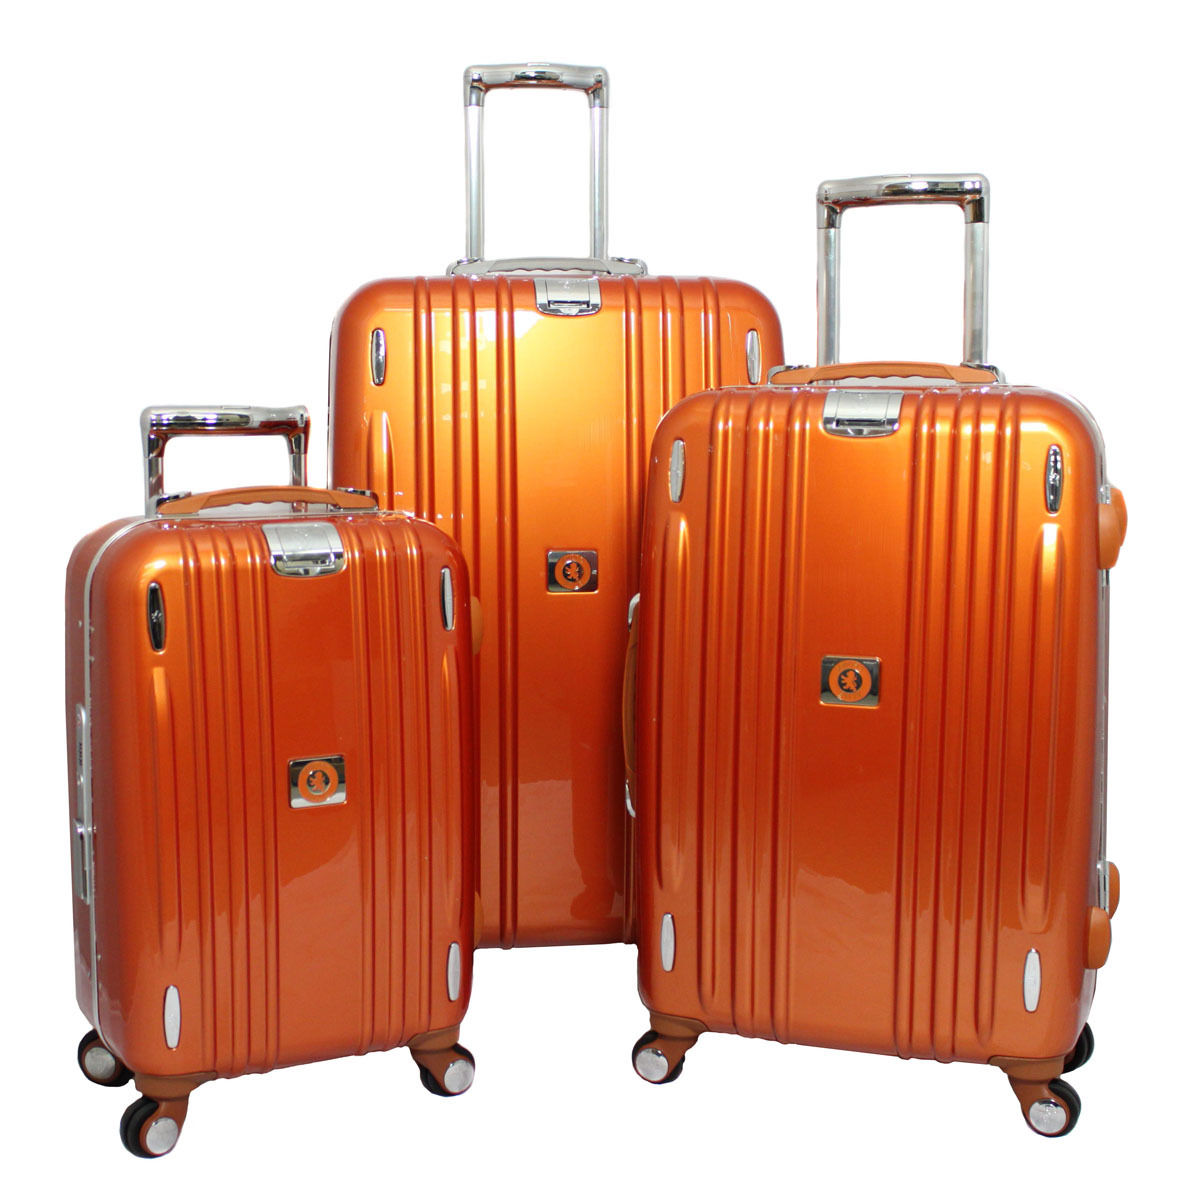 heys luggage luggage bag with wheels buy luggage bags online